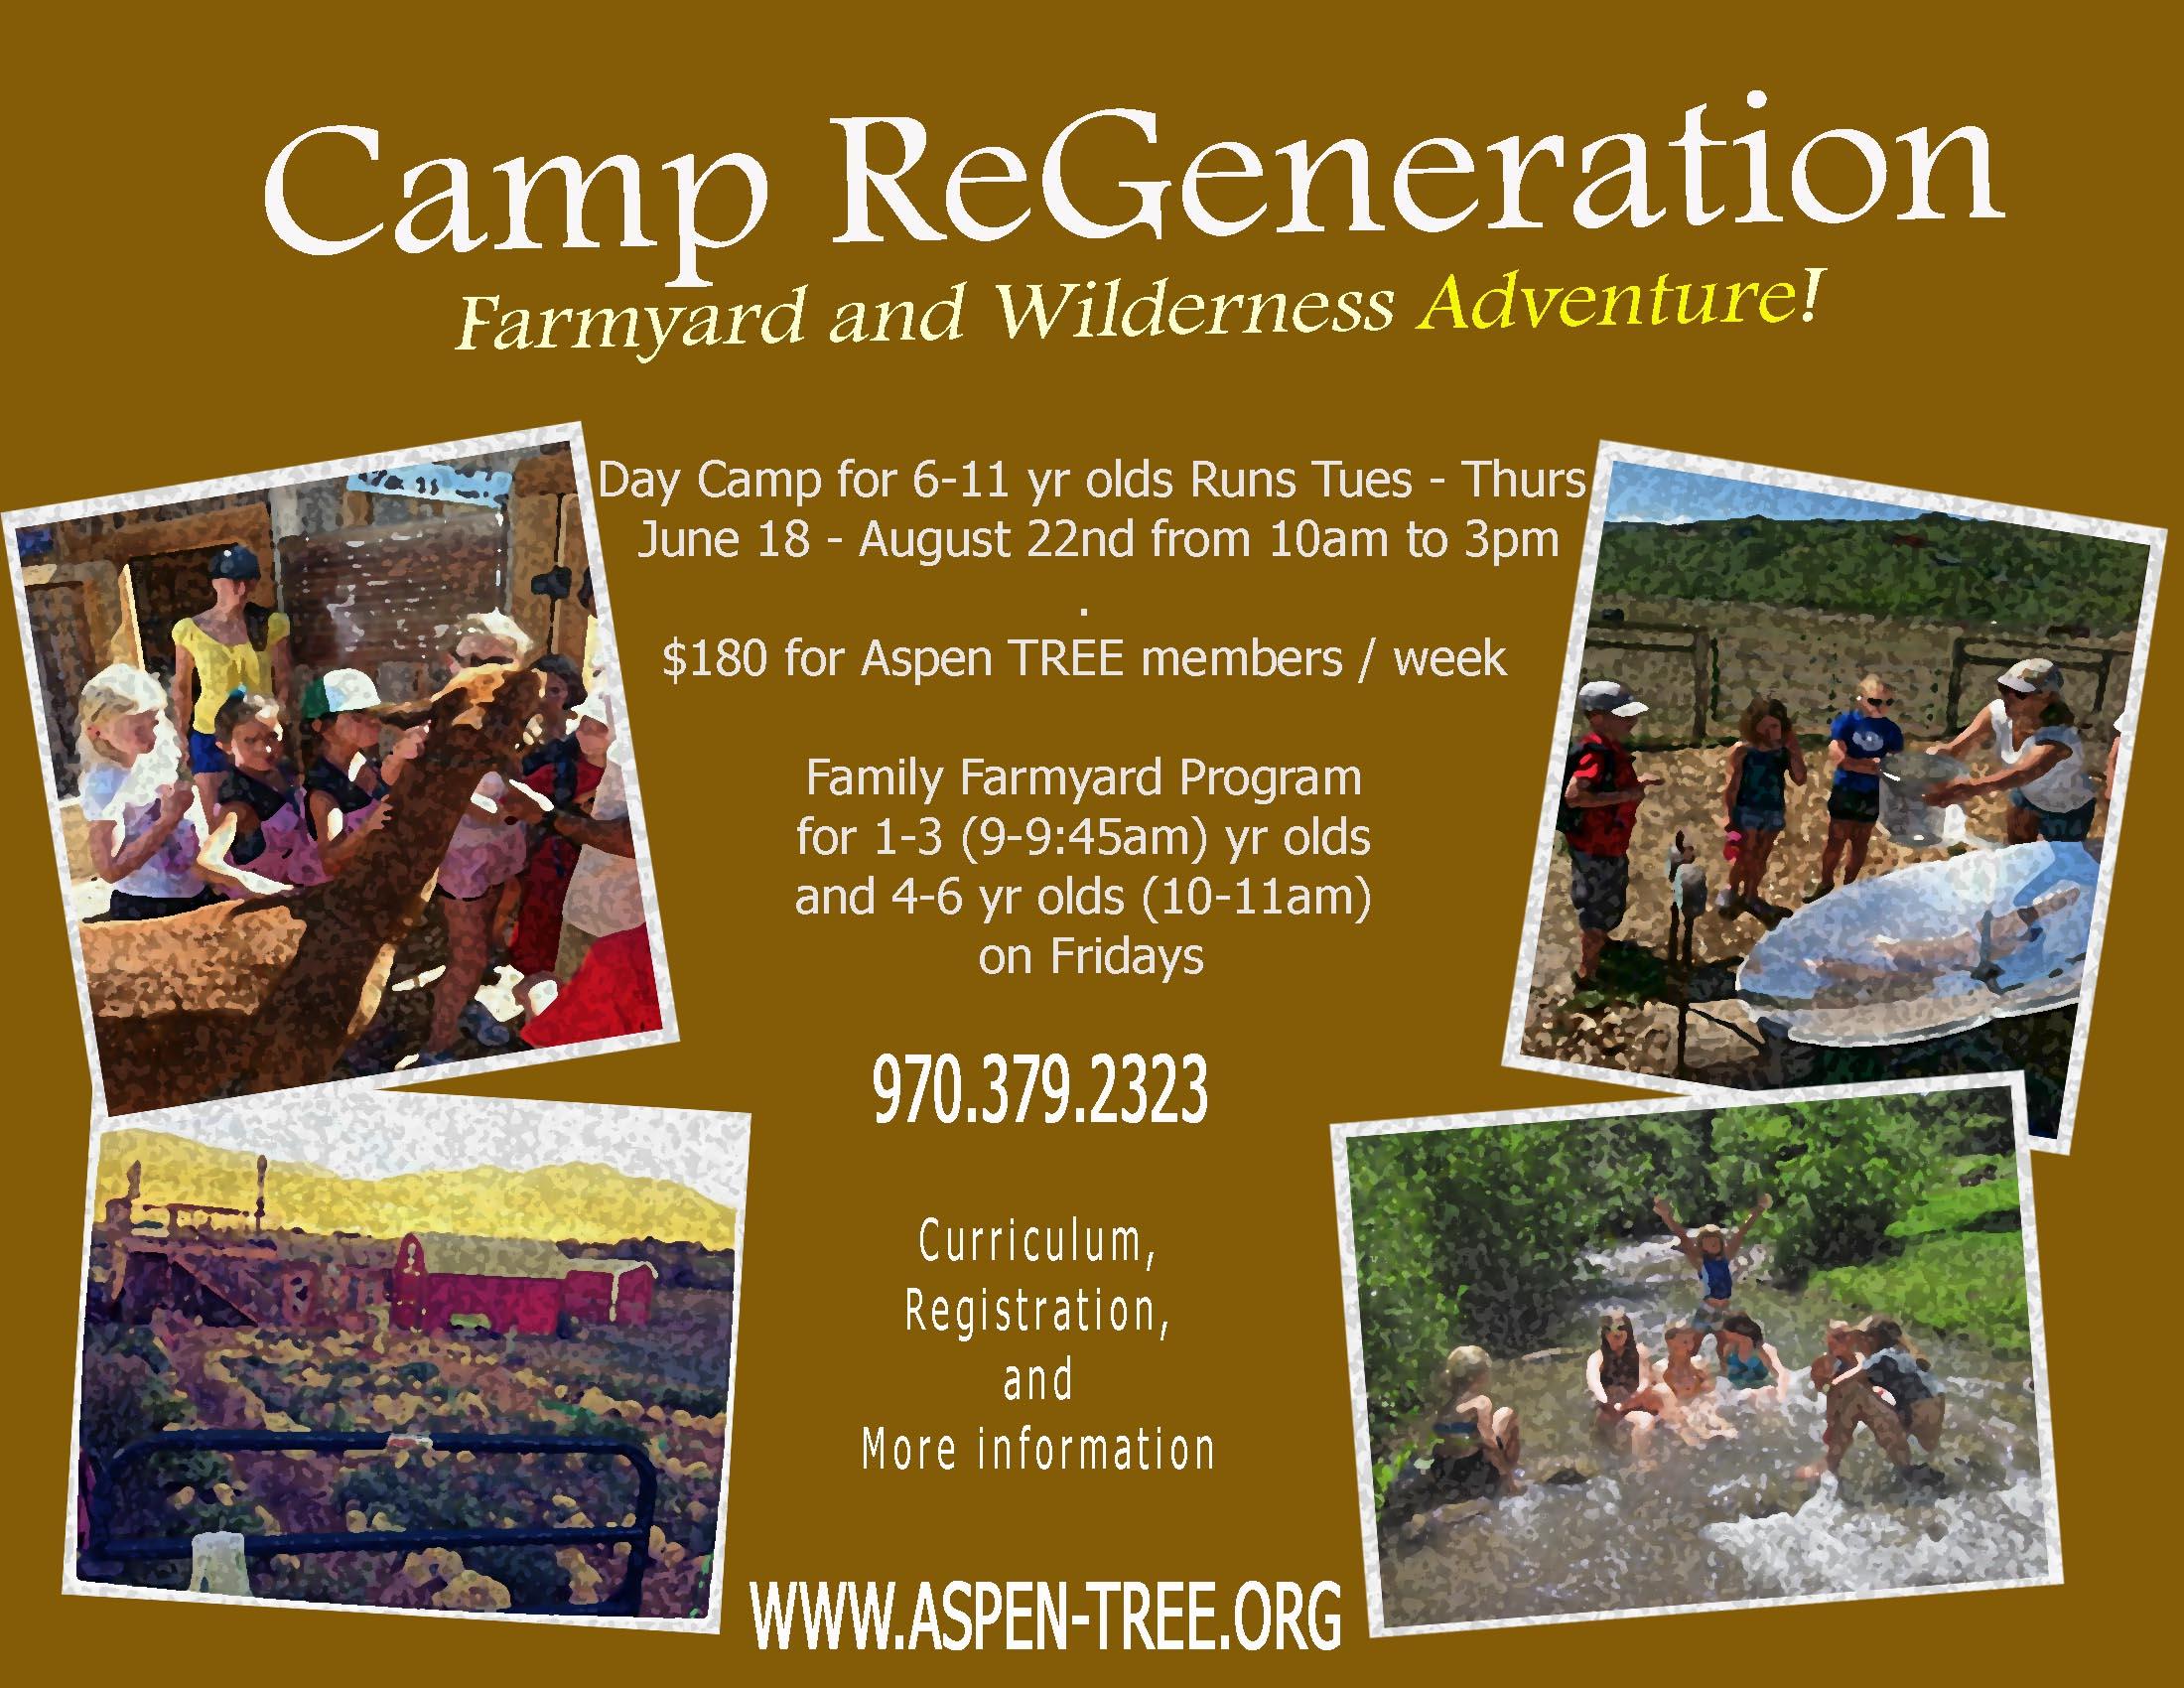 camp_regen_2013_flier_for email.jpg